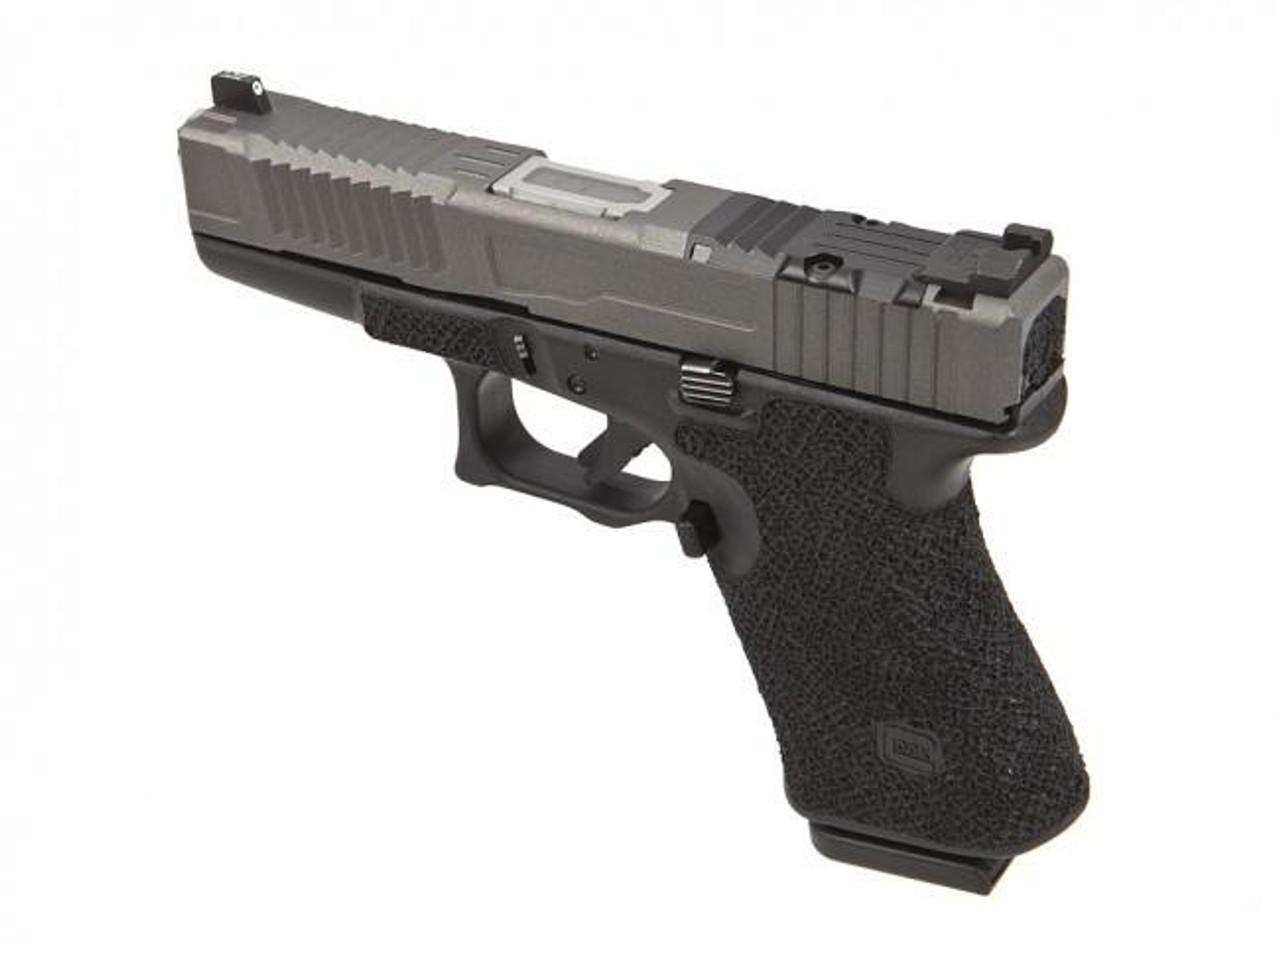 Rainier Arms Magazine Advanced Release System - Glock (MARS)